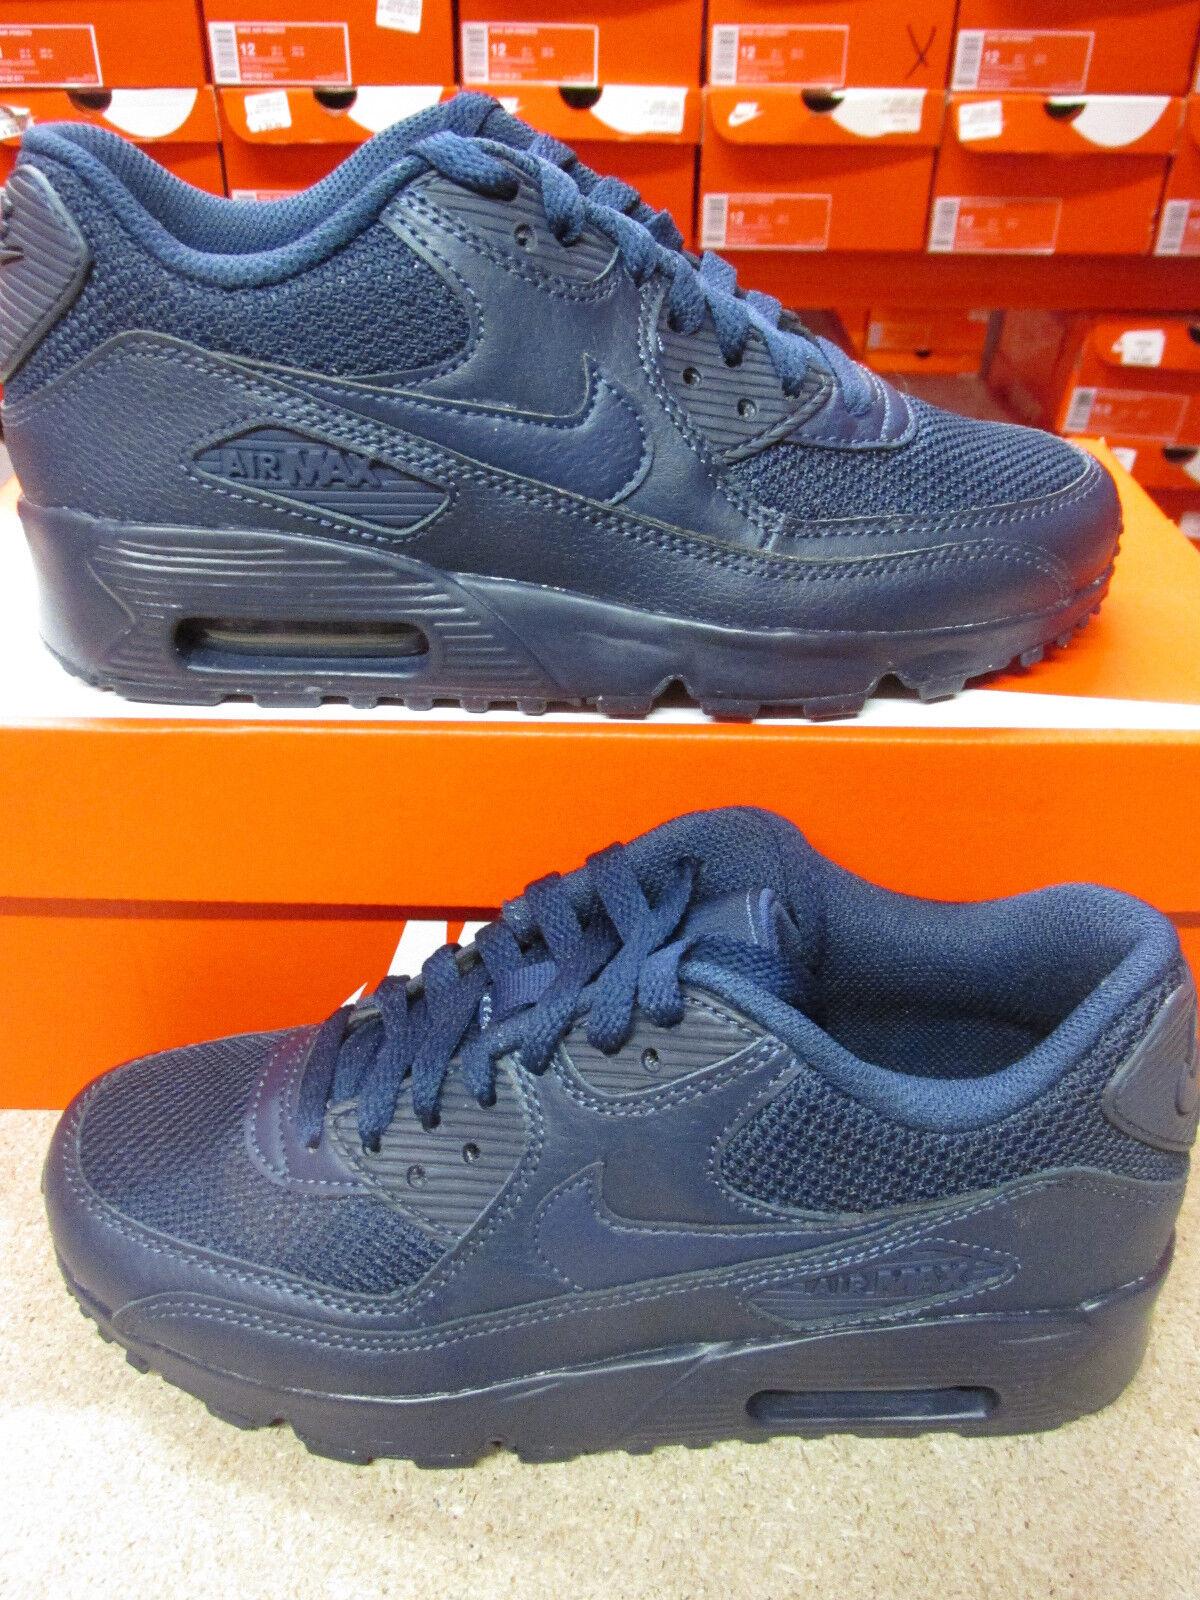 Nike Air Max 90 Mesh (GS) 833418 401 Sneakers Shoes